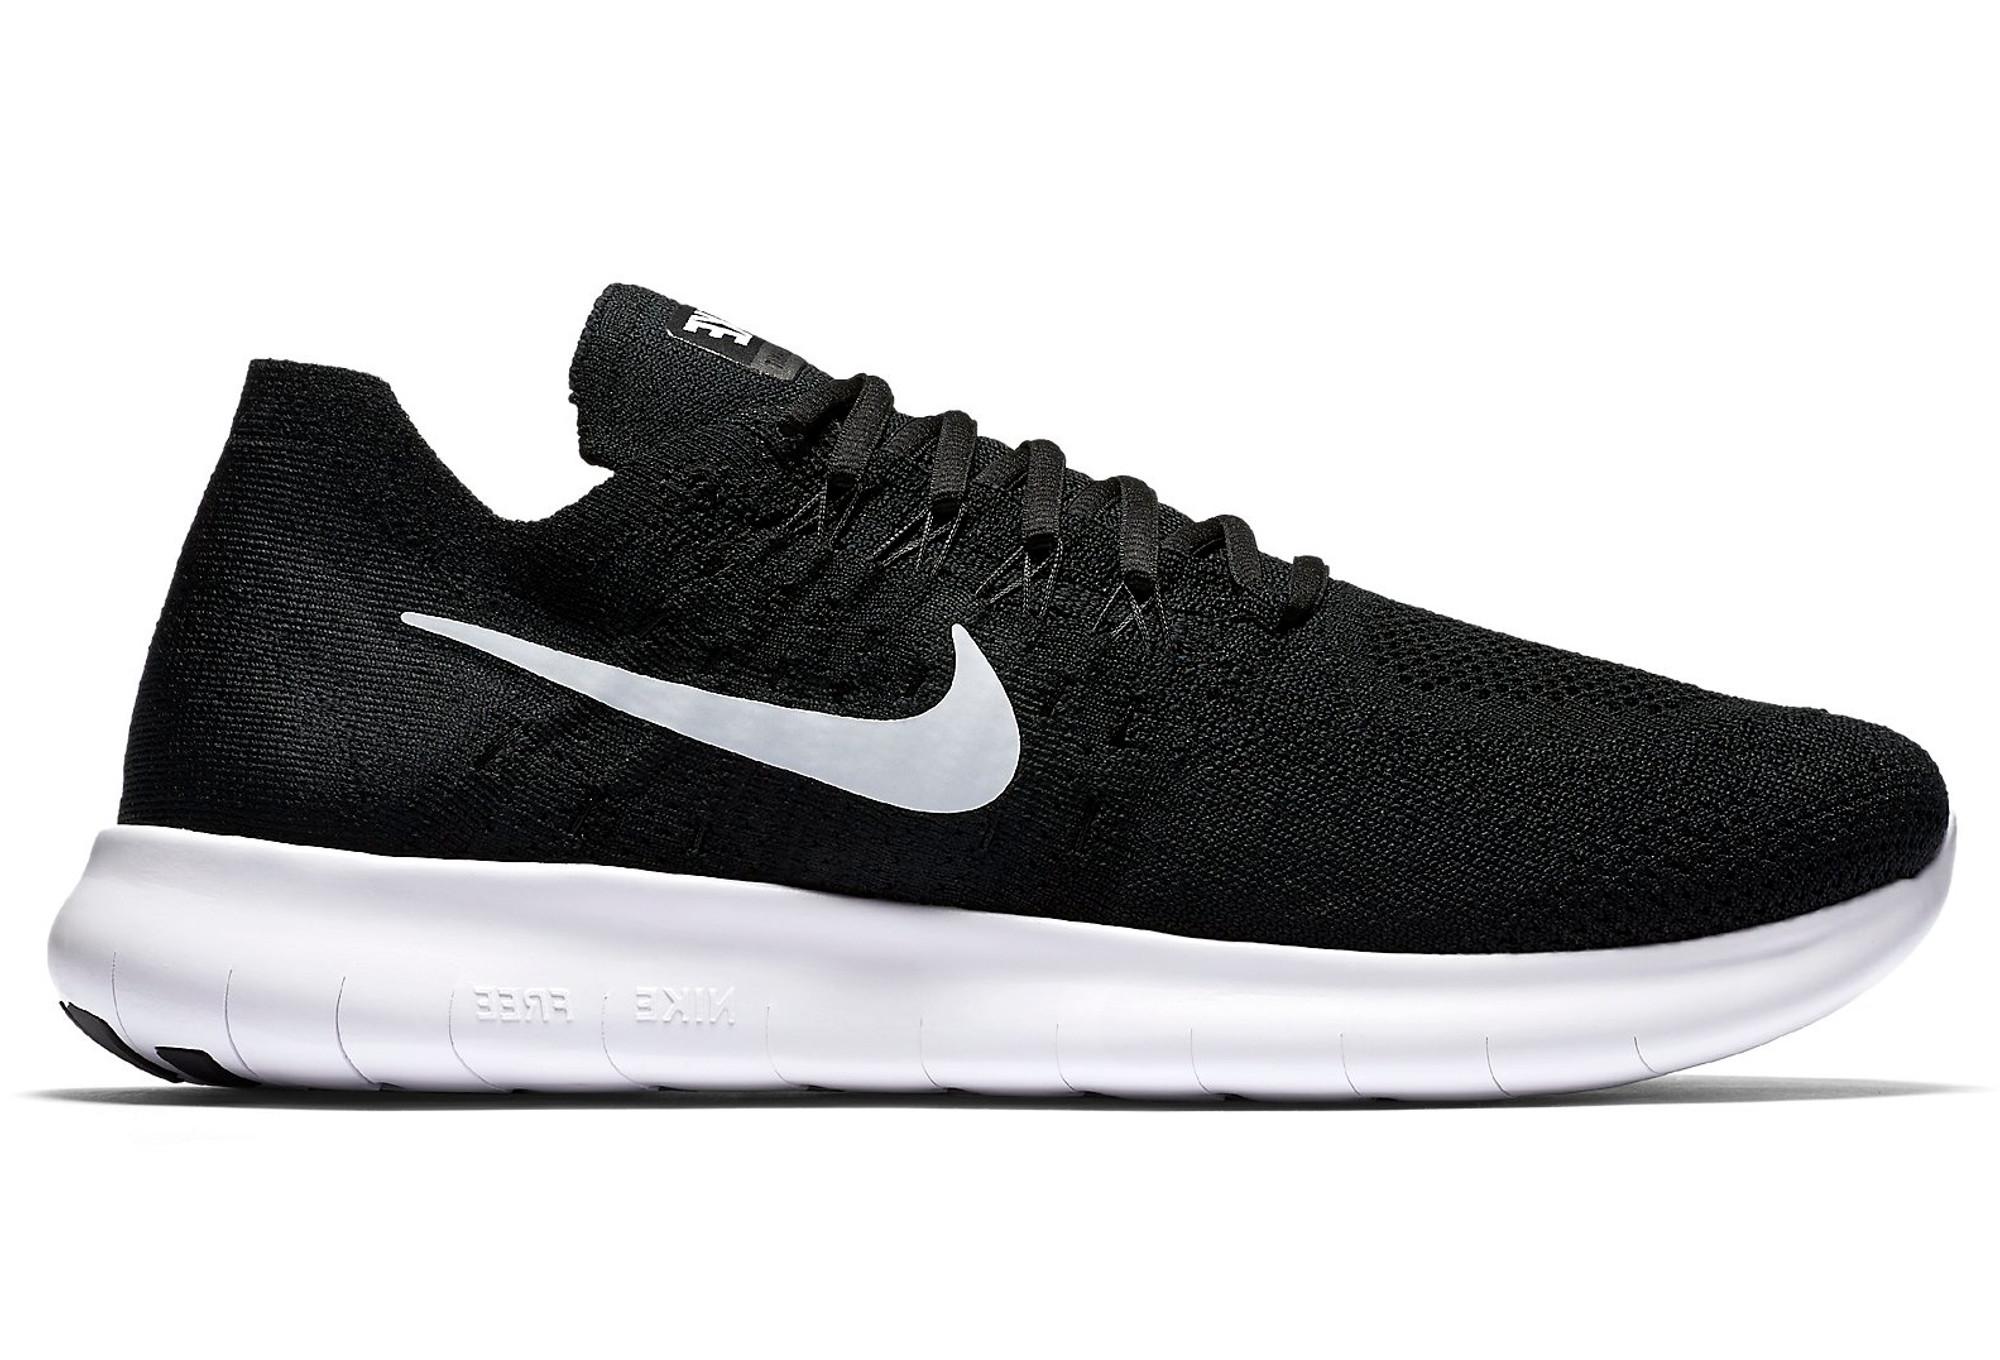 new product a28cc 25f8e Nike Free Run Flyknit Shoe Black White Men